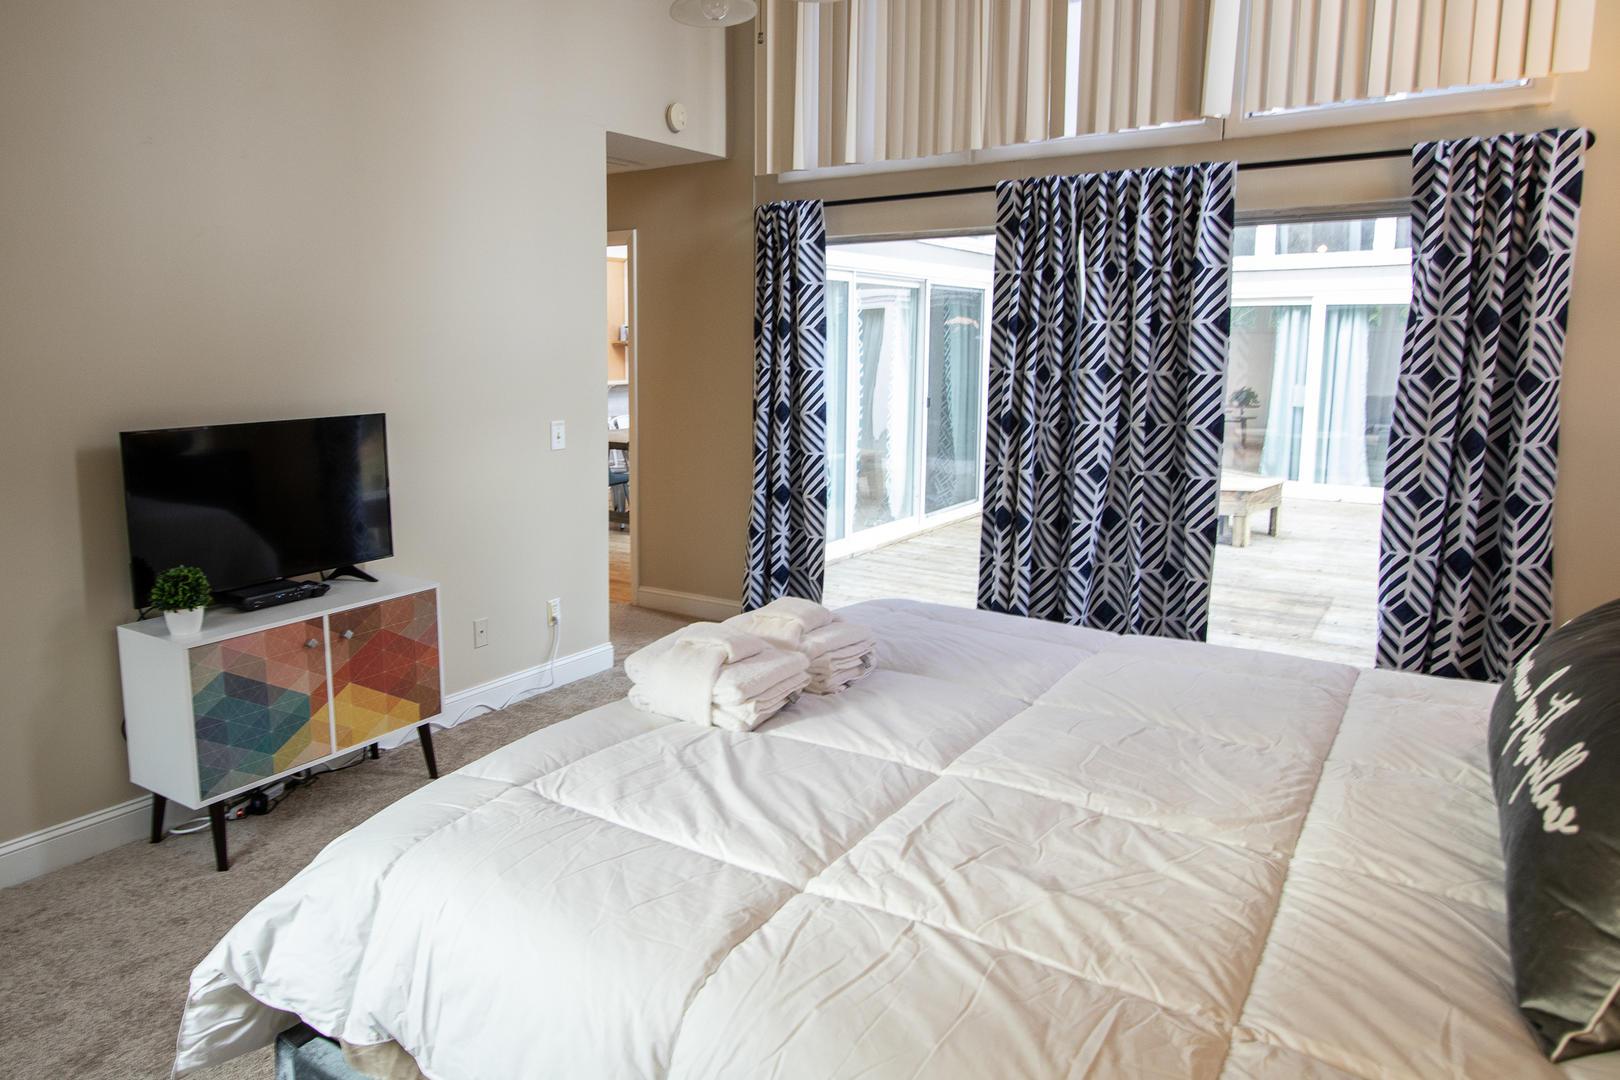 Master, TV, access to back deck, en suite full bath